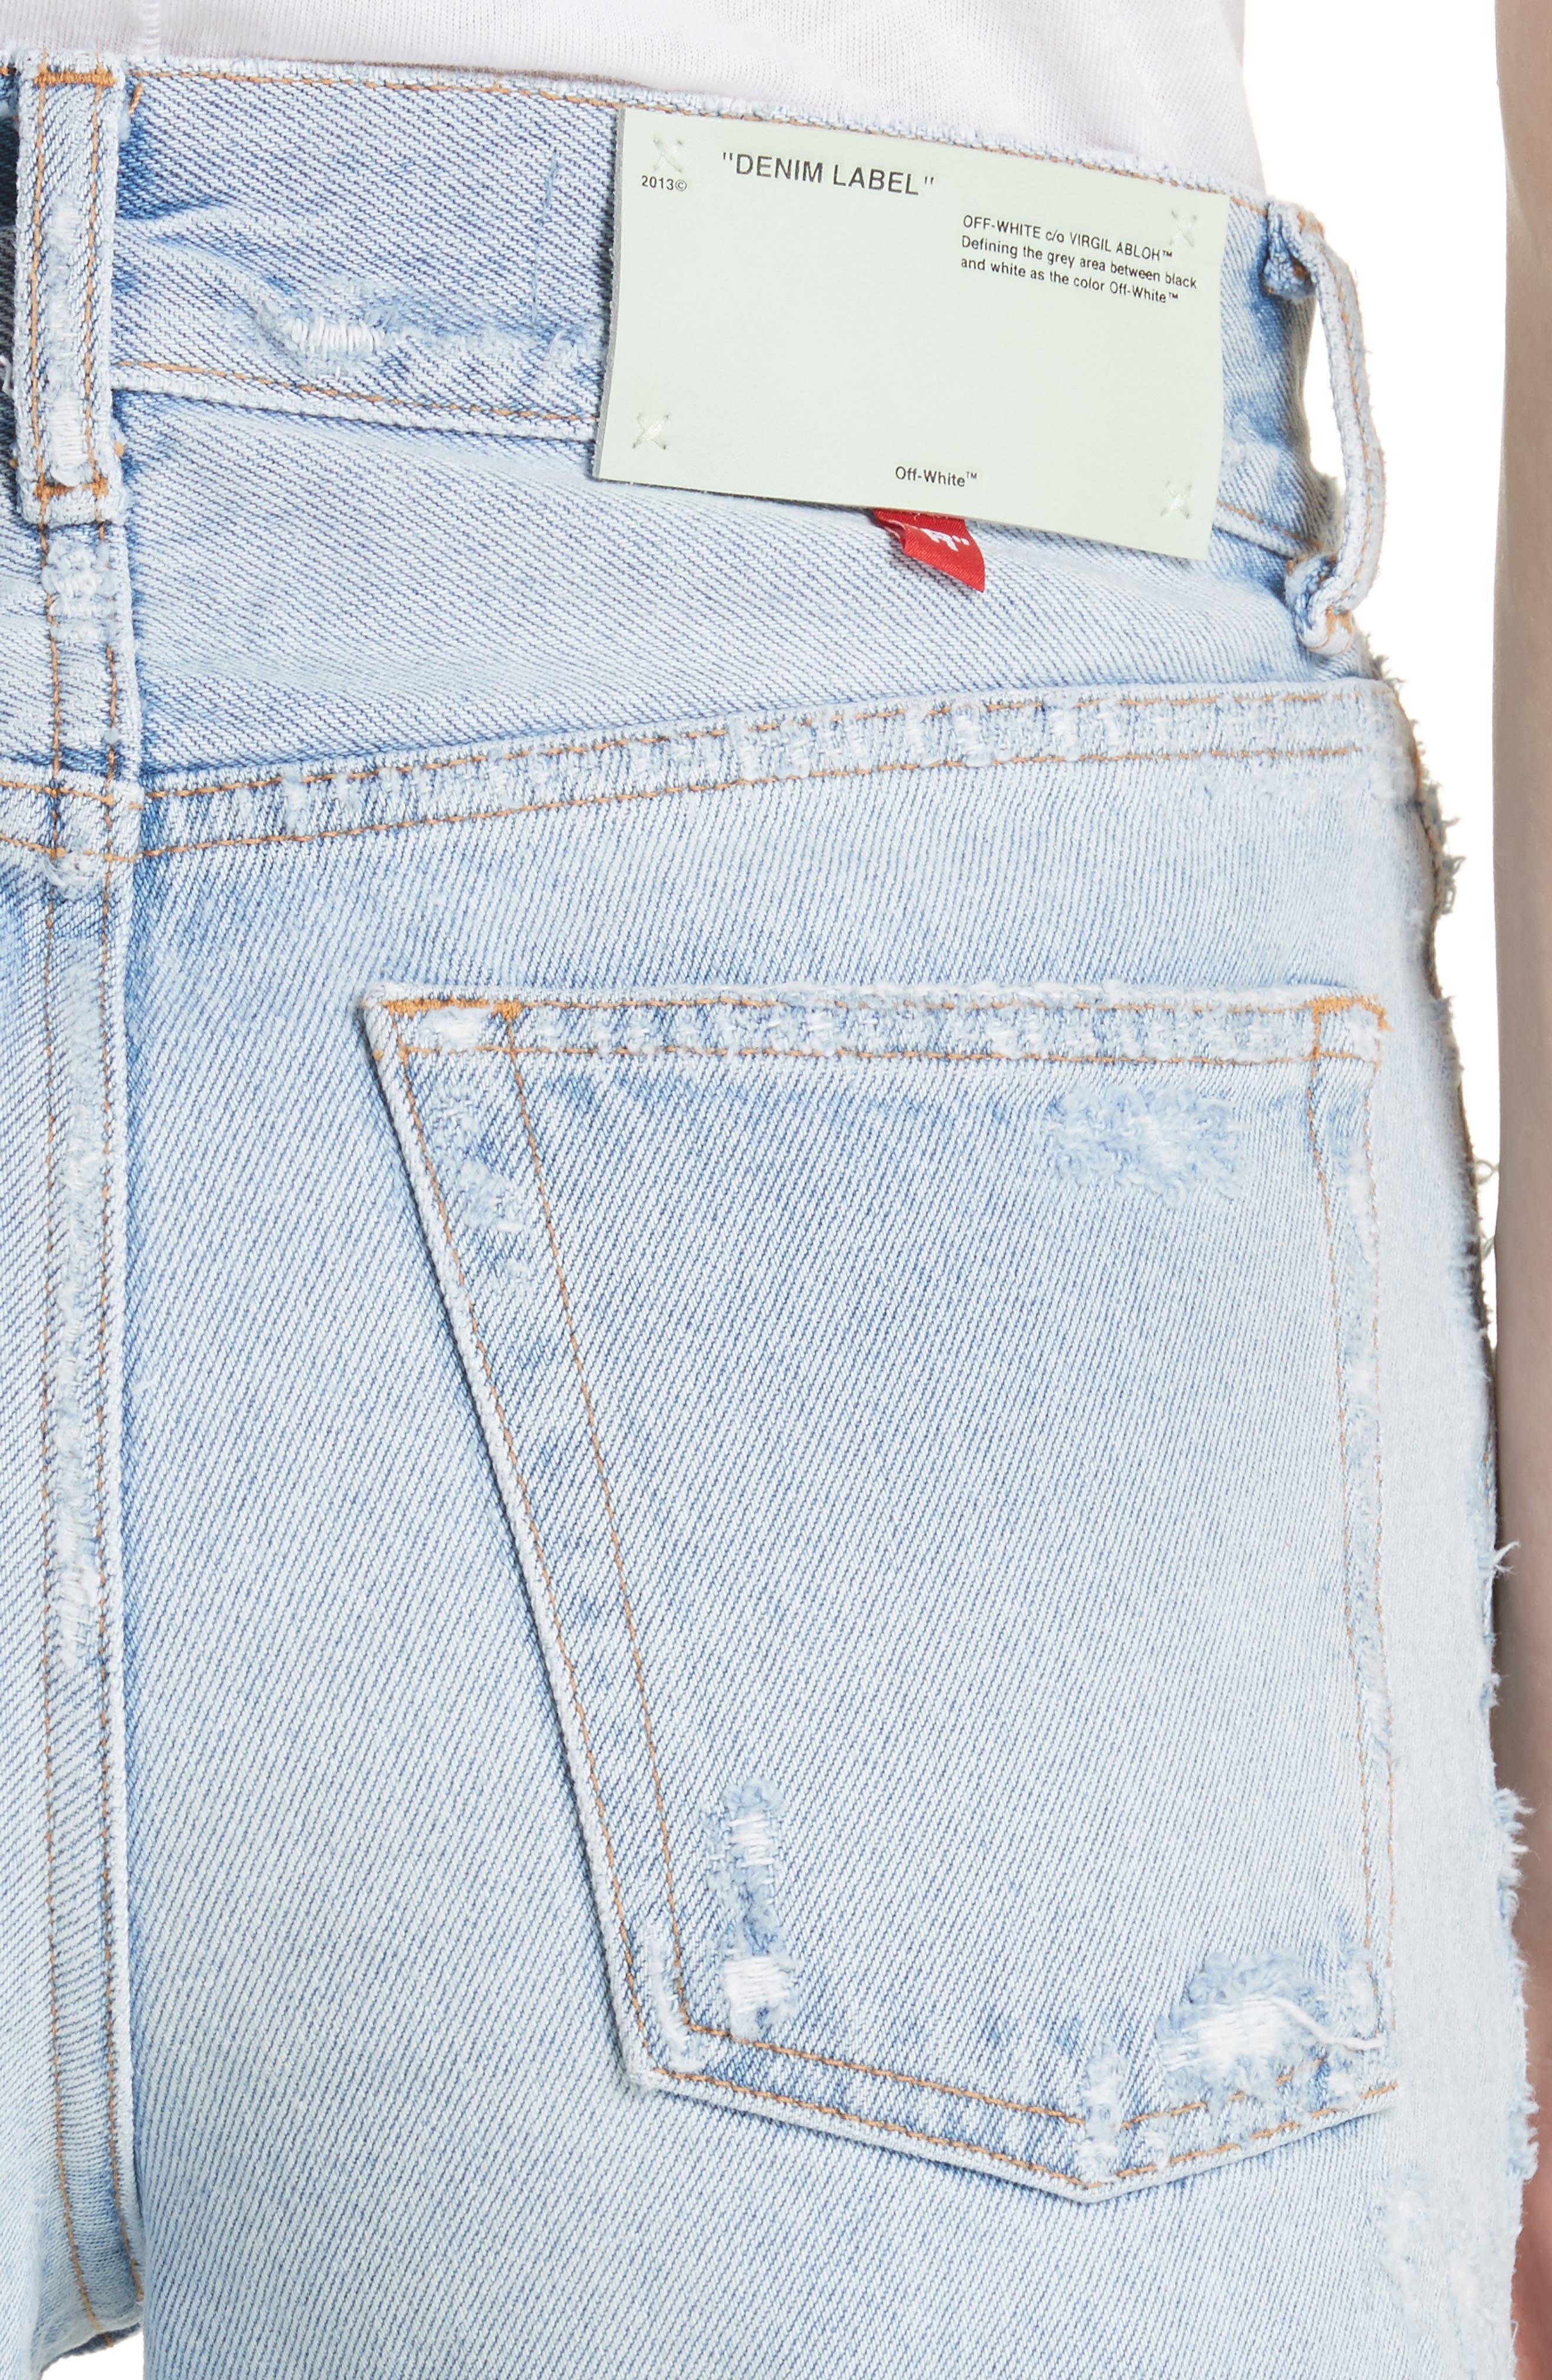 Distressed Straight Leg Jeans,                             Alternate thumbnail 5, color,                             400